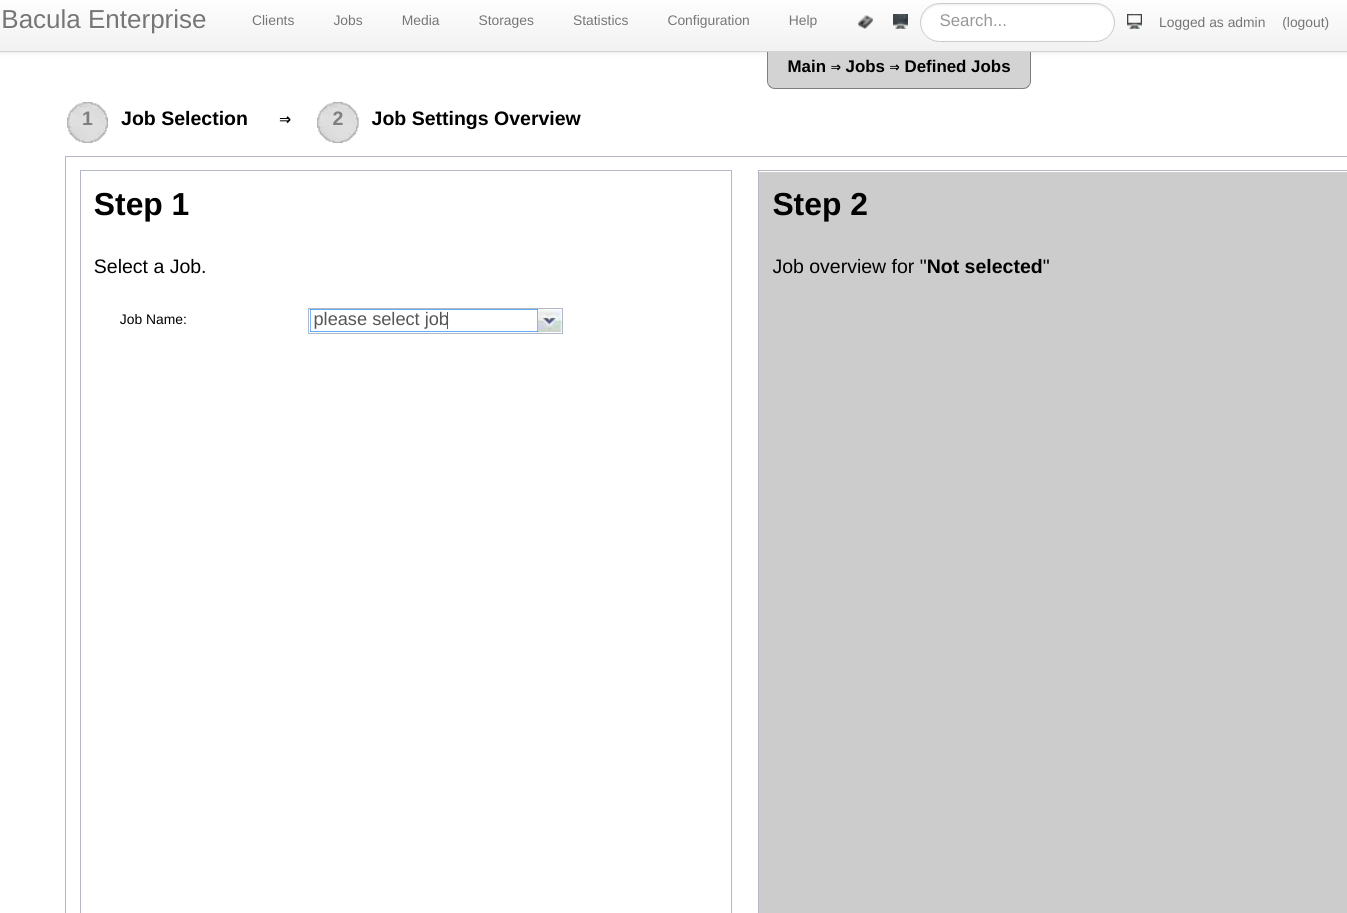 Bweb EBacula Quick Guide 11